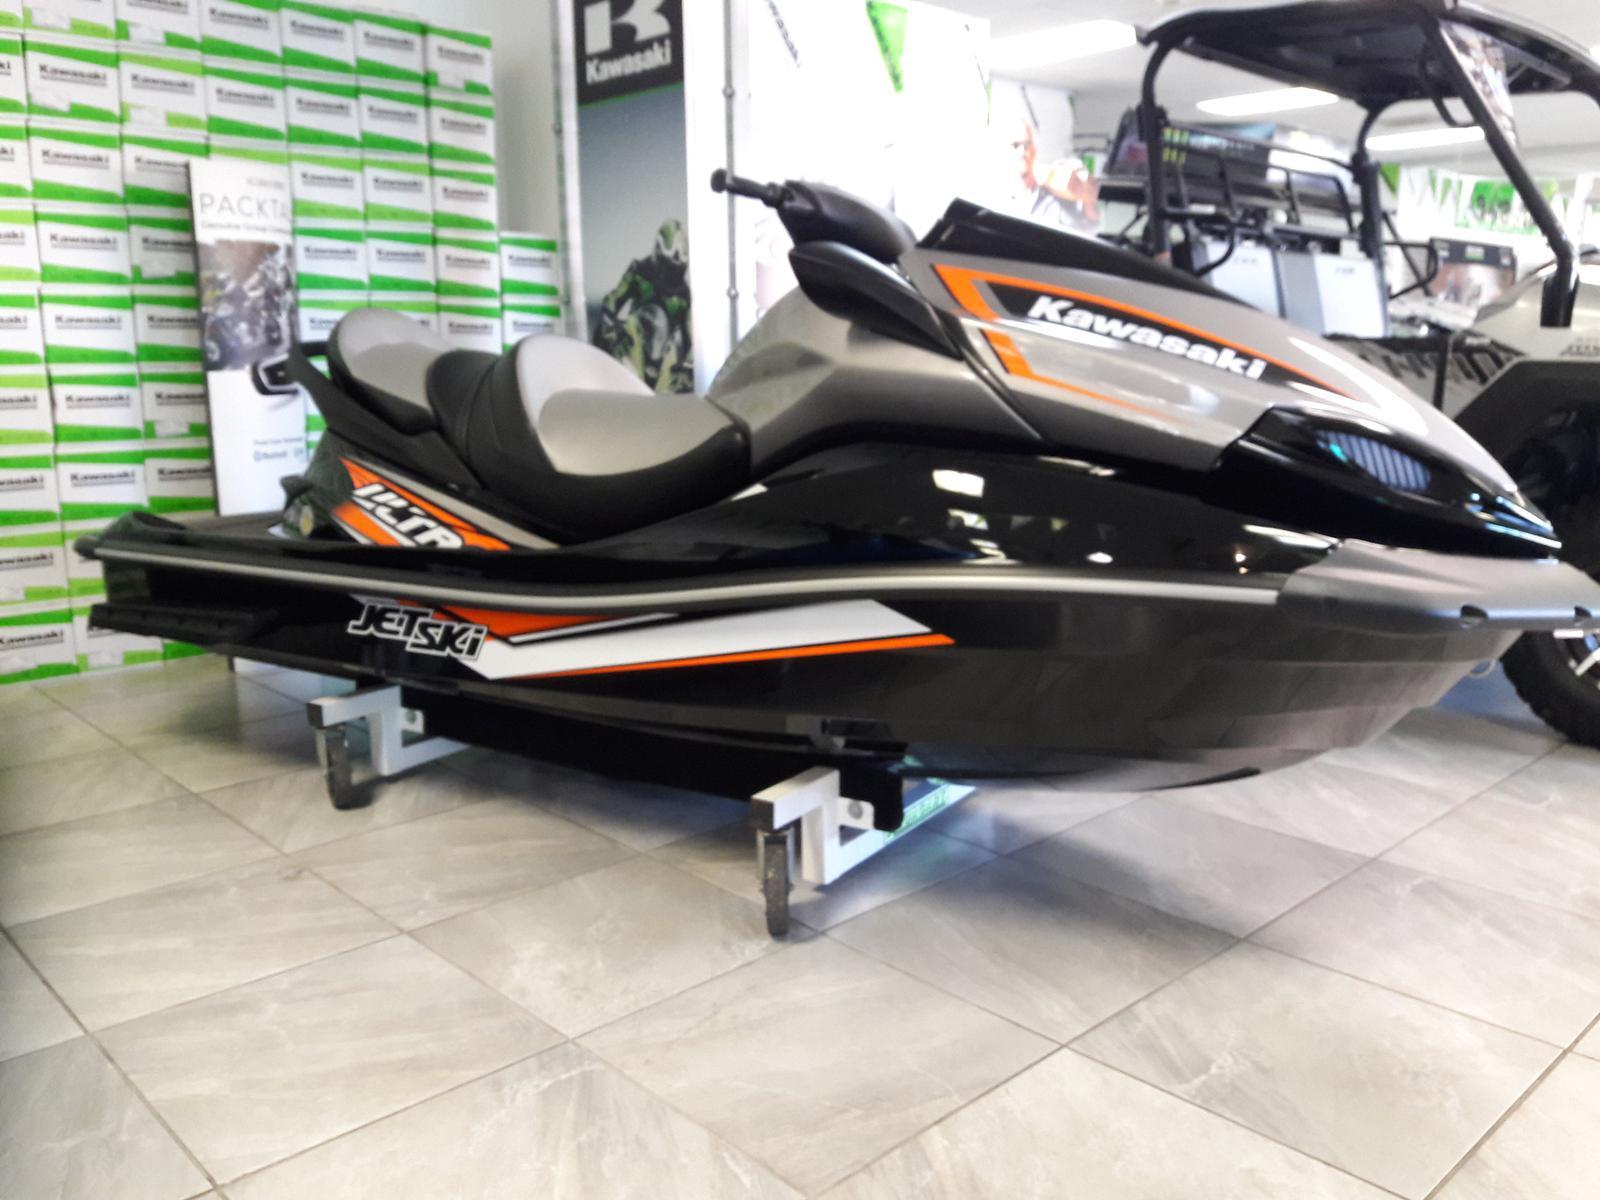 2018 Kawasaki Ultra LX Jet Ski for sale in Mesa, AZ. Kelly's ...